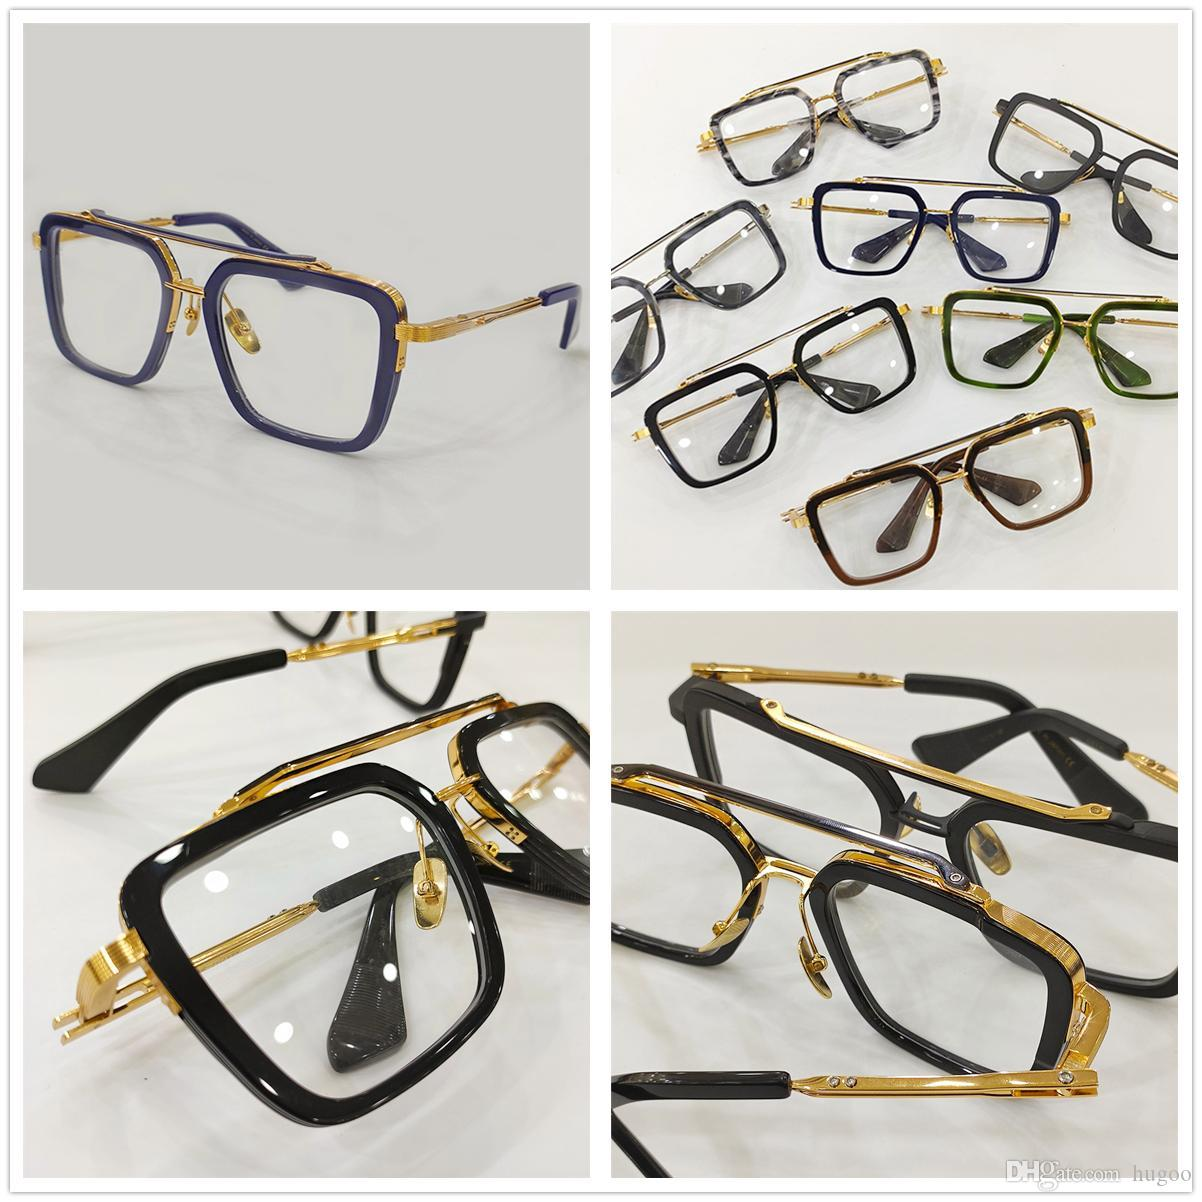 Mens Fashion Steampunk Eye Transparent Glasses Clear Vintage Glass Eyeglasses Myopia Presbyopia Prescription Optical Spectacle Frames MACH7